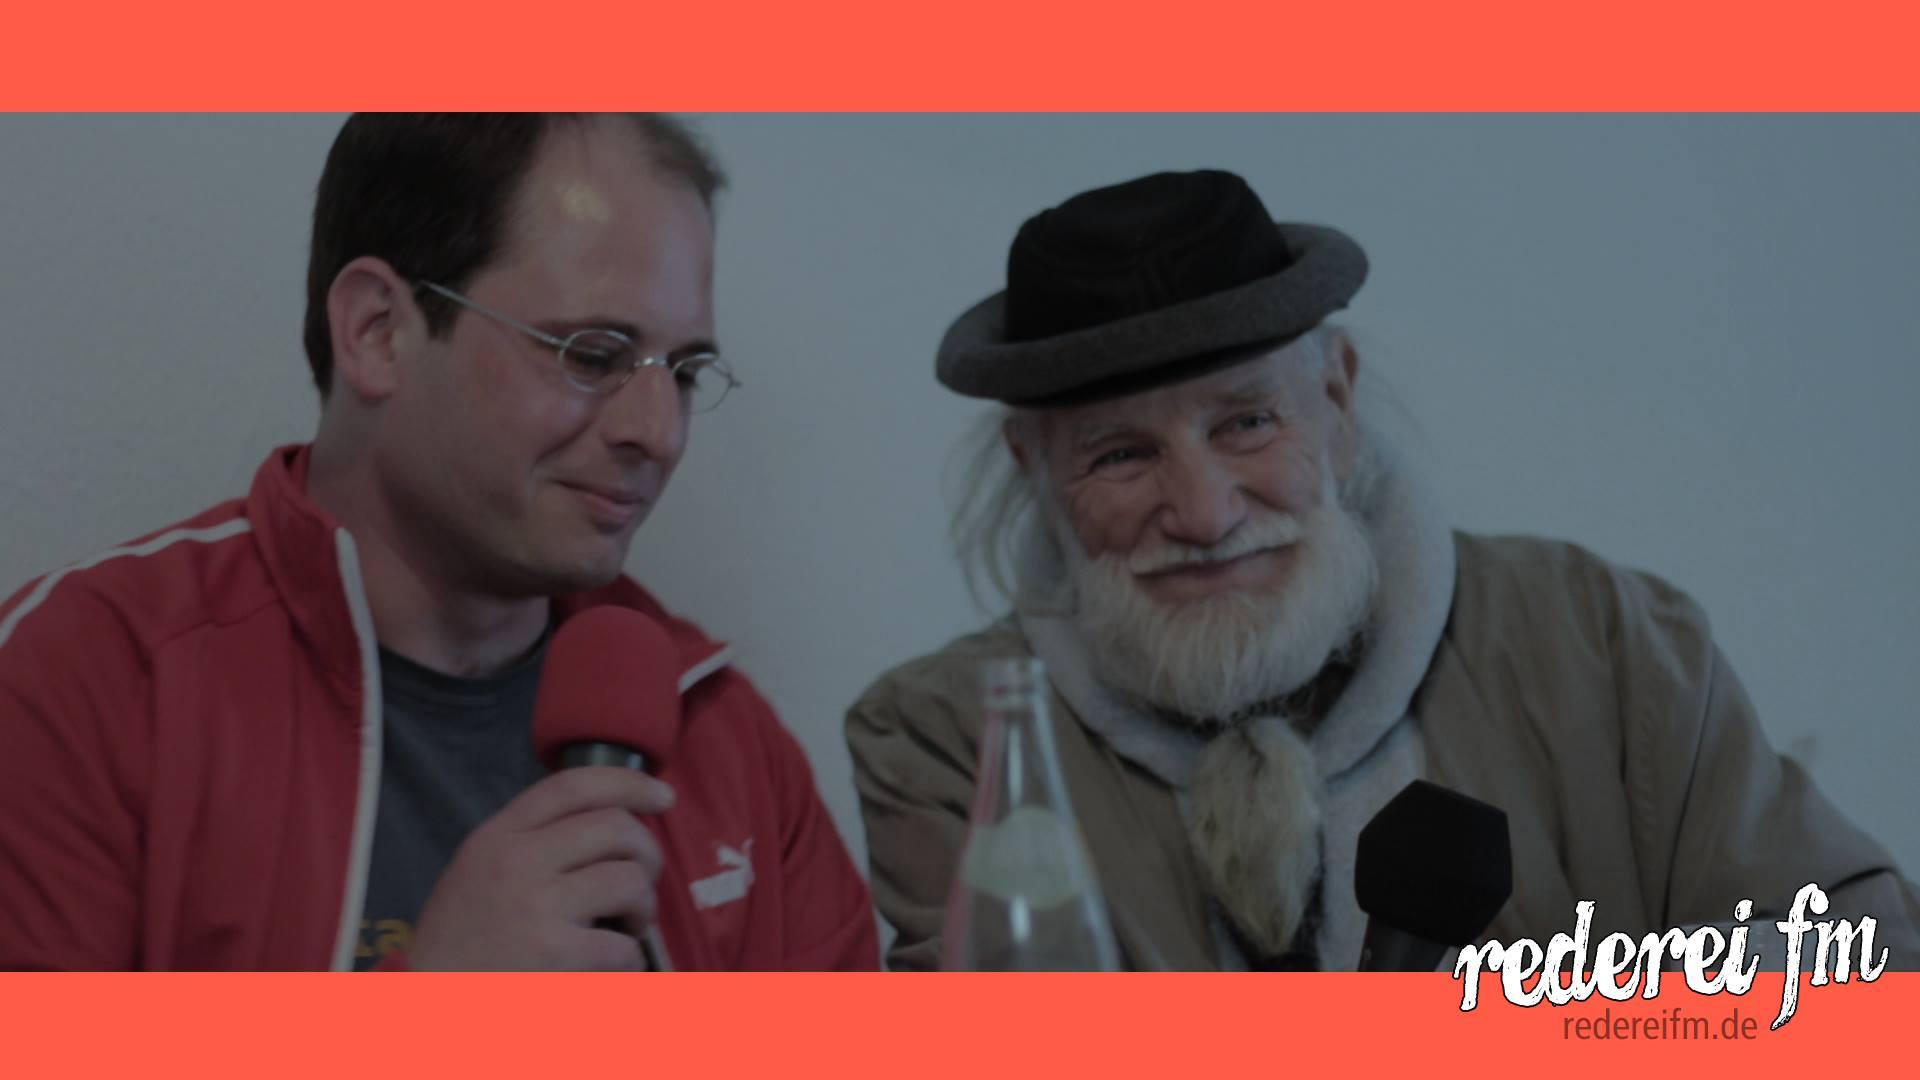 Vera Partei - Komet Bernhard - Felix Herzog - Rederei FM 2